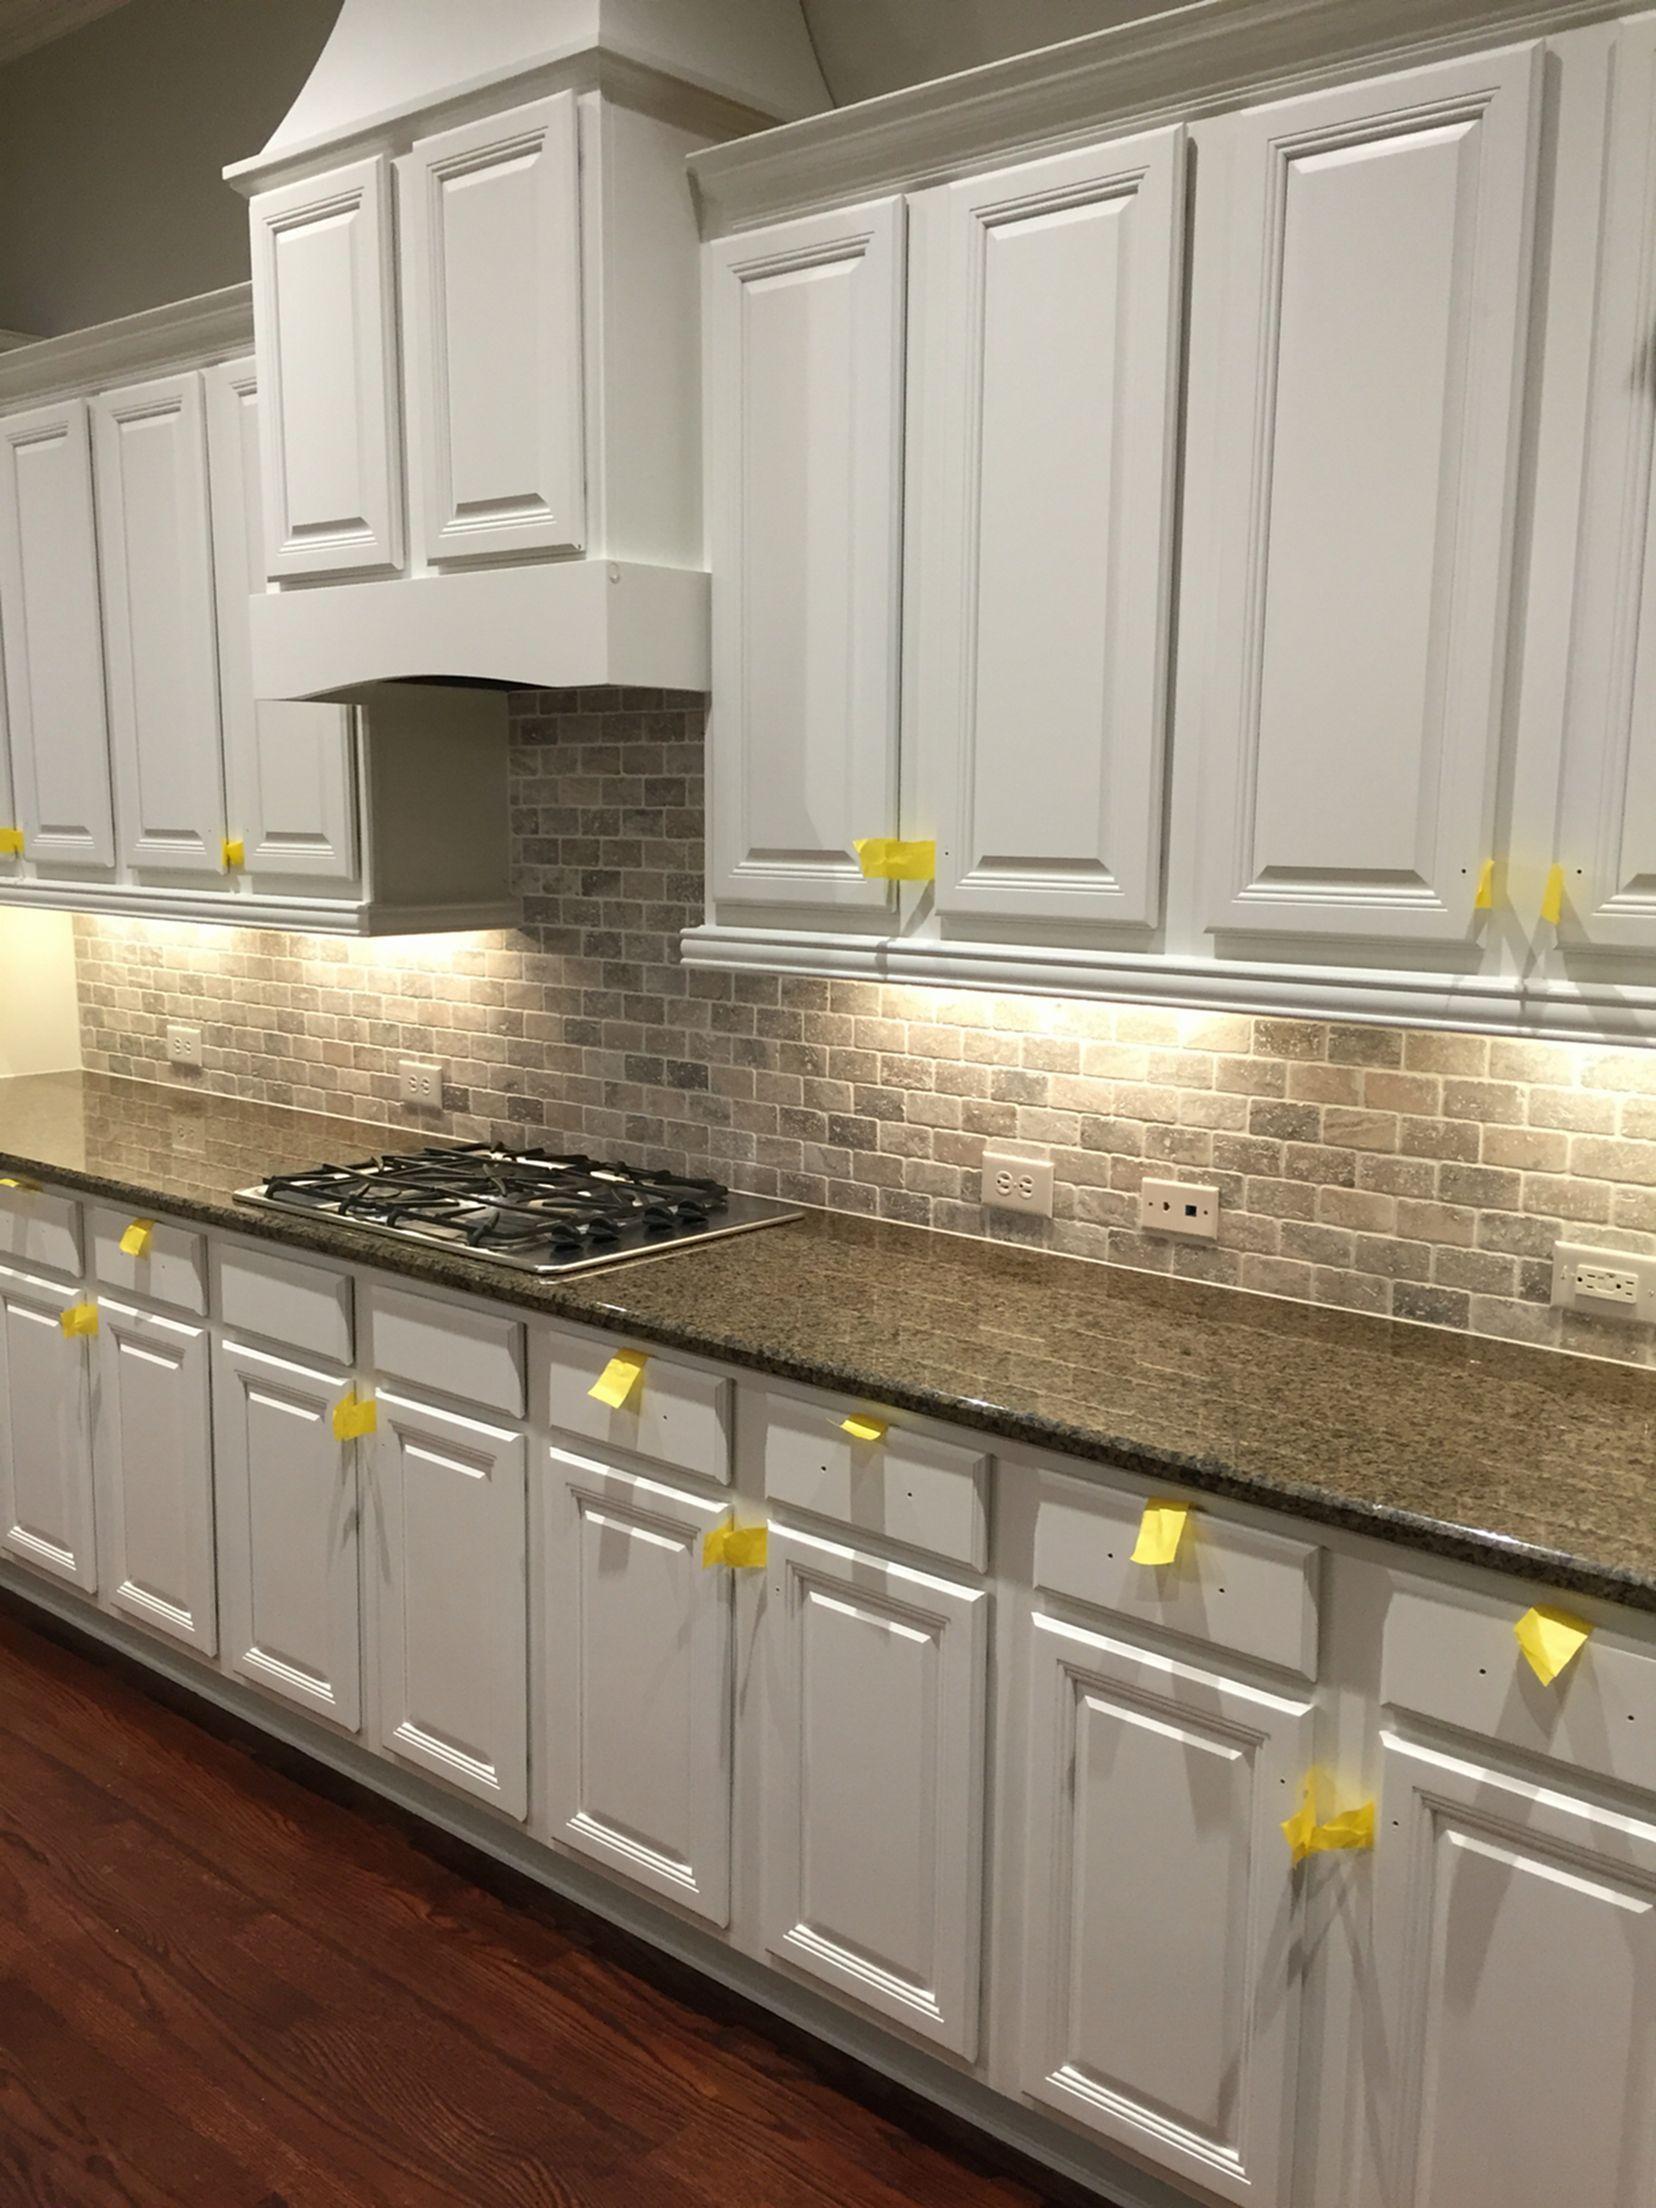 Outstanding 88 Gorgeous Travertine Backsplash Ideas For Awesome Home Decor https://freshoom.com/12514-88-gorgeous-travertine-backsplash-ideas-awesome-home-decor/